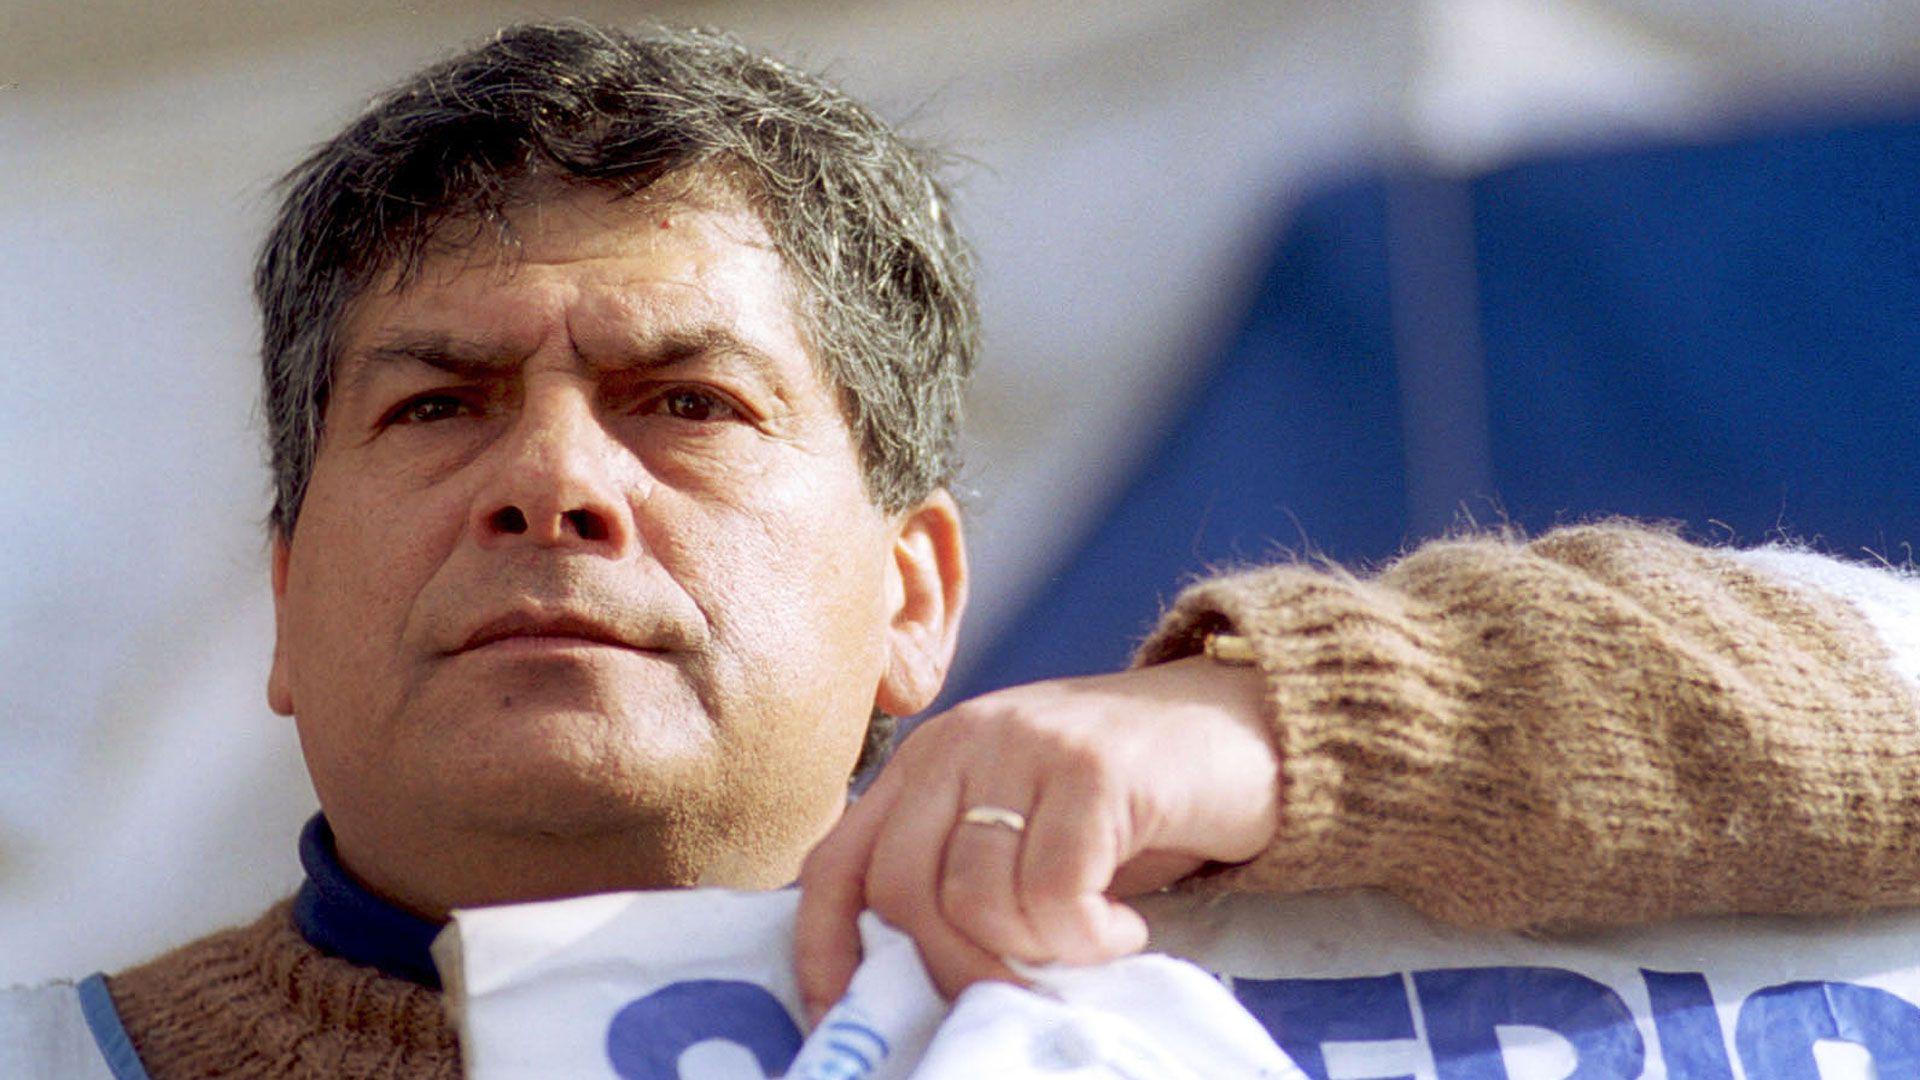 Juan Carlos Alderete (NA)